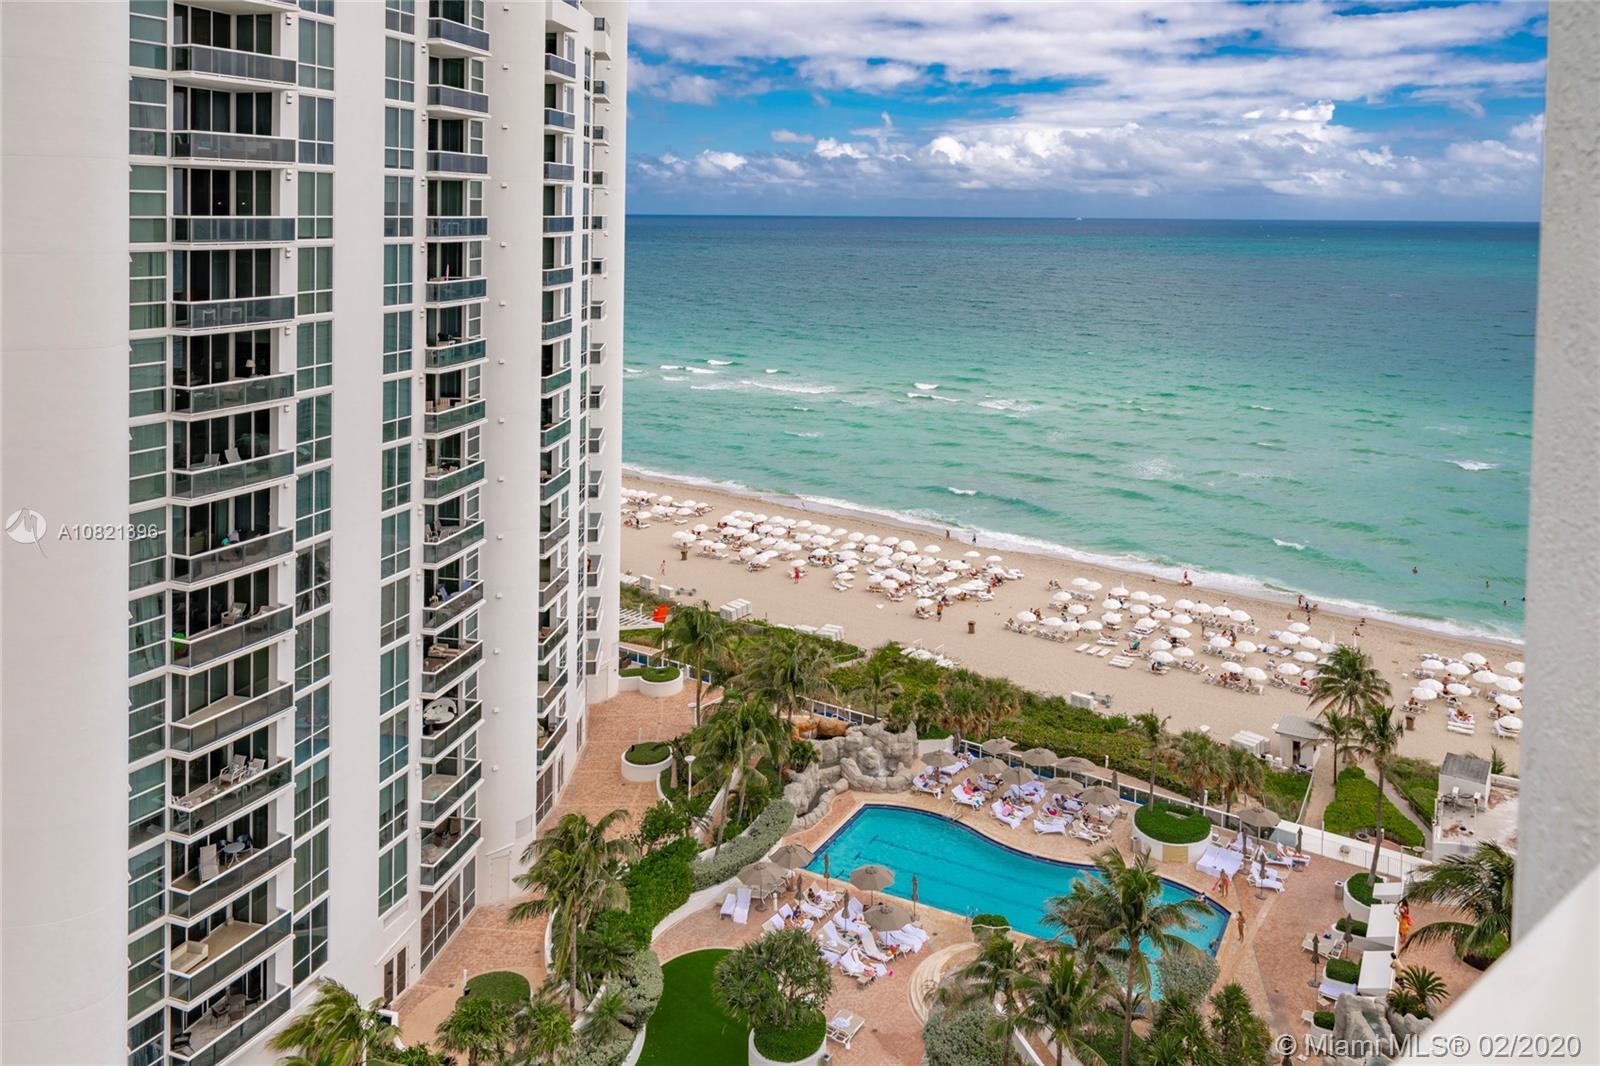 Trump International #1205 - 18001 Collins Ave #1205, Sunny Isles Beach, FL 33160